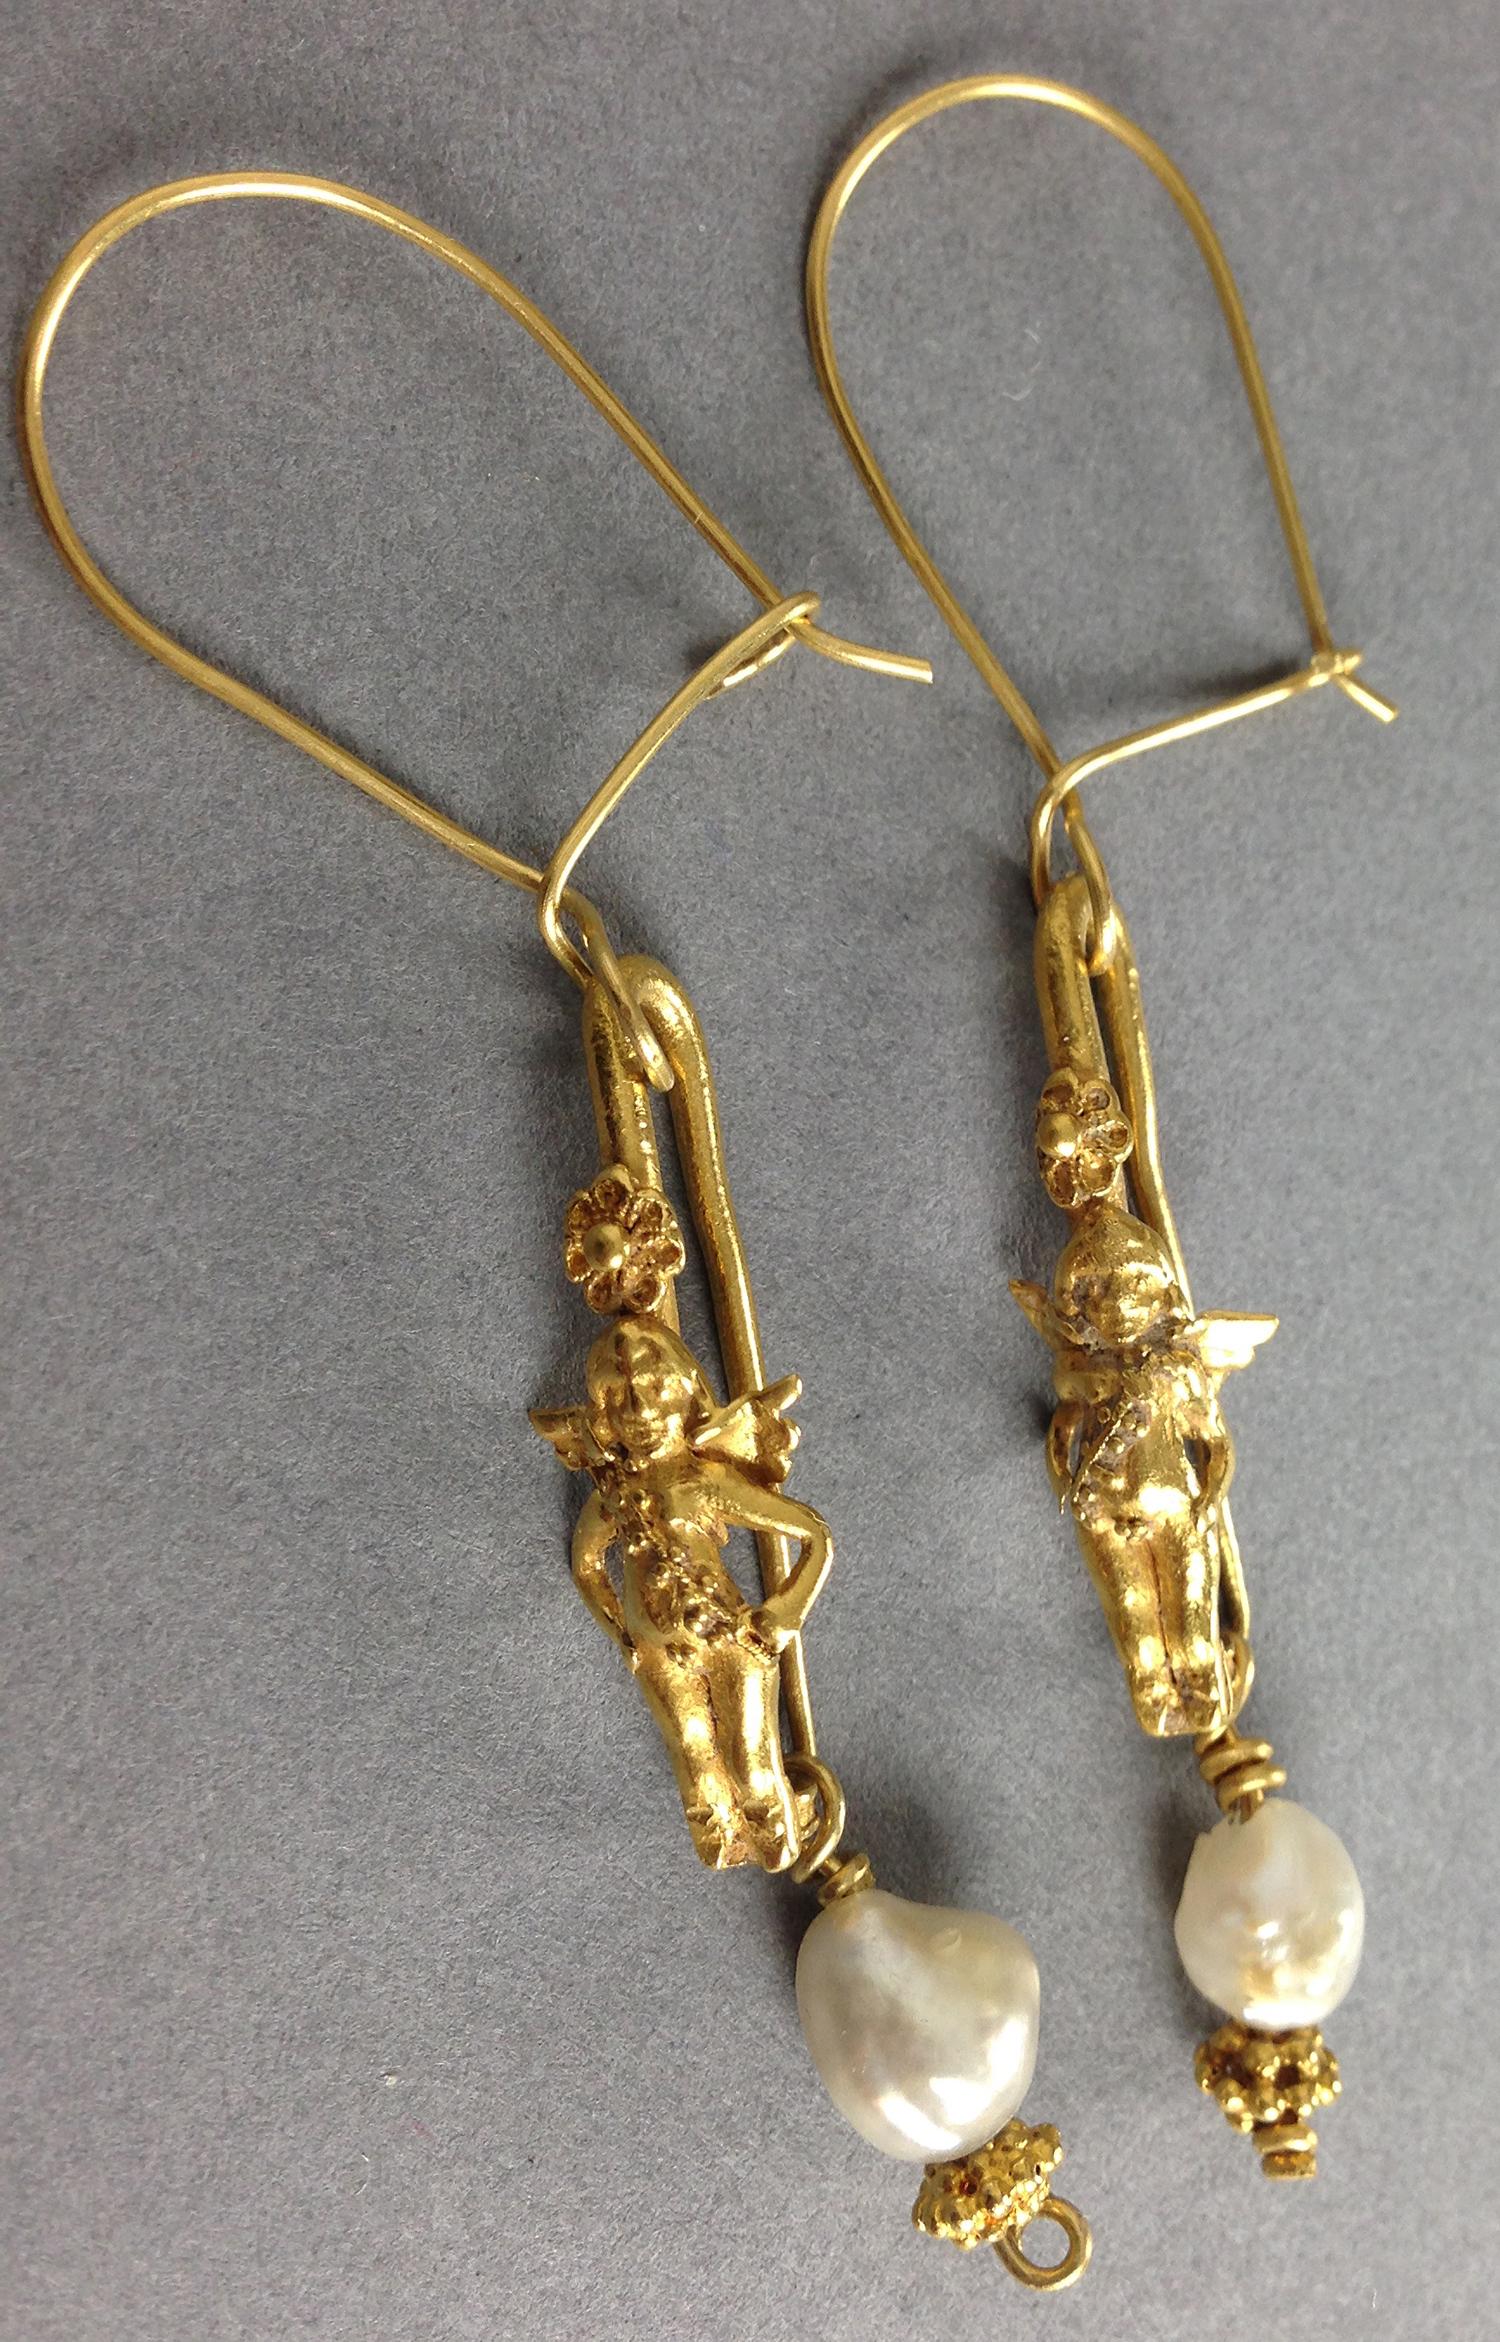 Hixenbaugh Ancient Art Presents A Collection Of Ancient